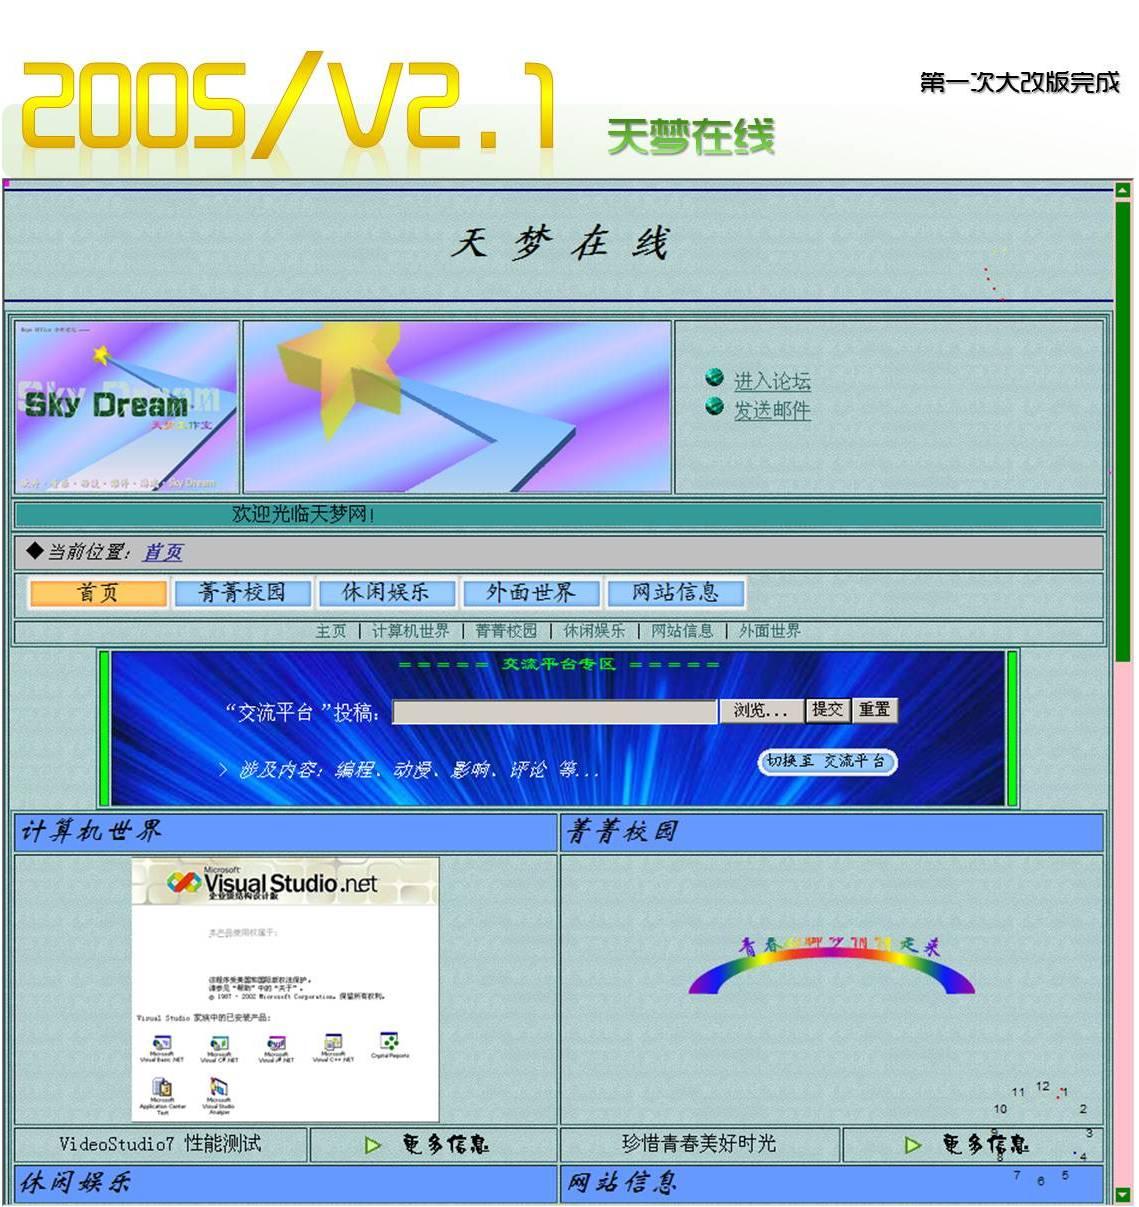 2005/2.1